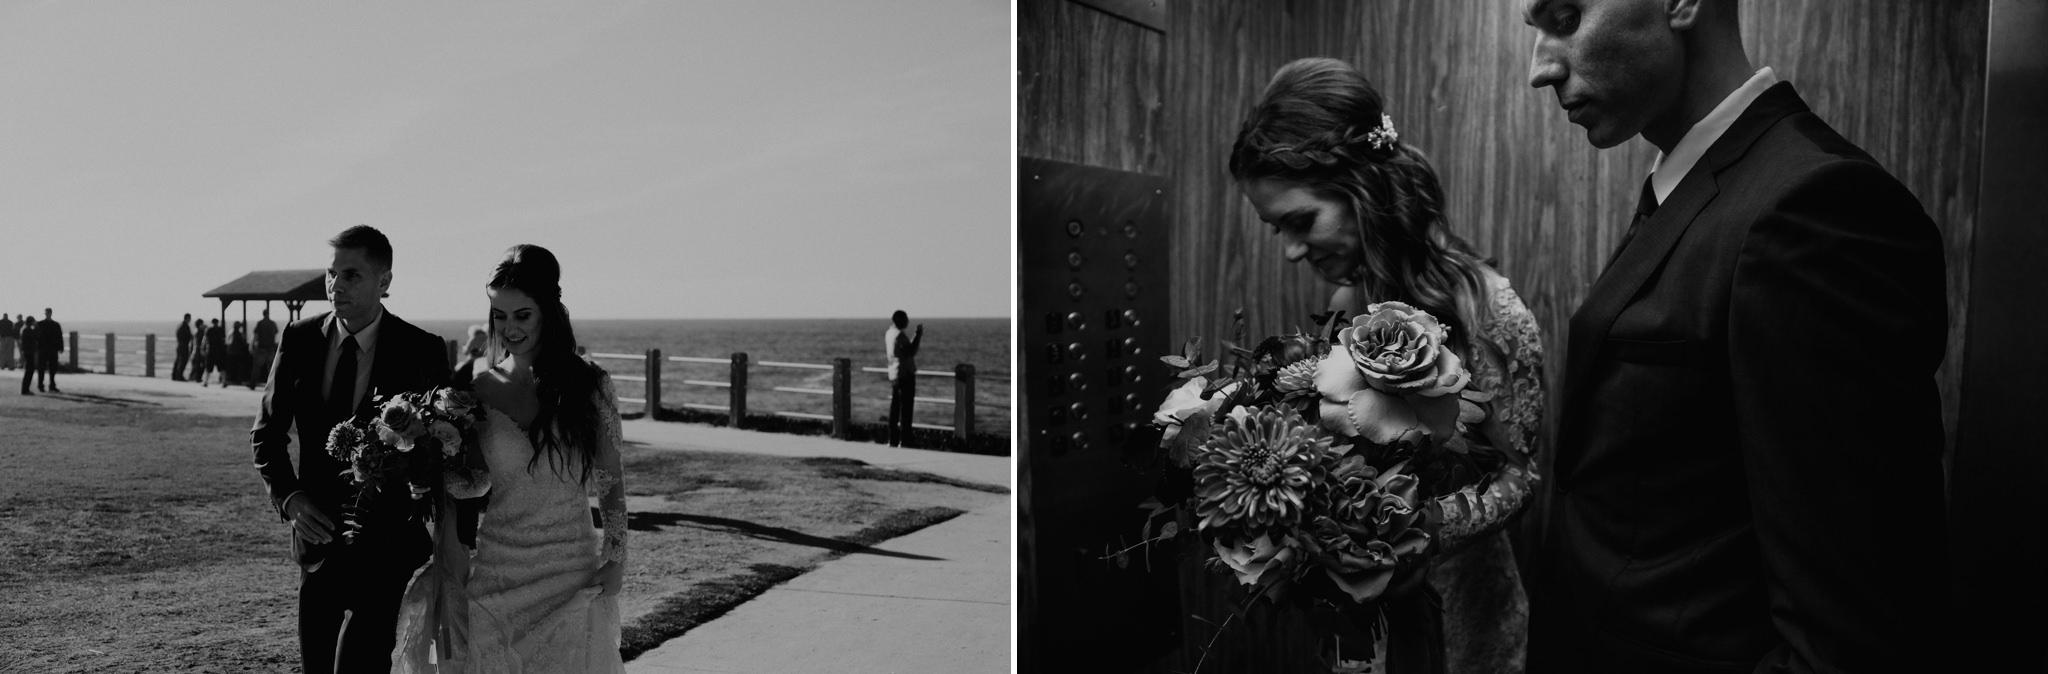 Maui-Wedding-Photographer8.jpg